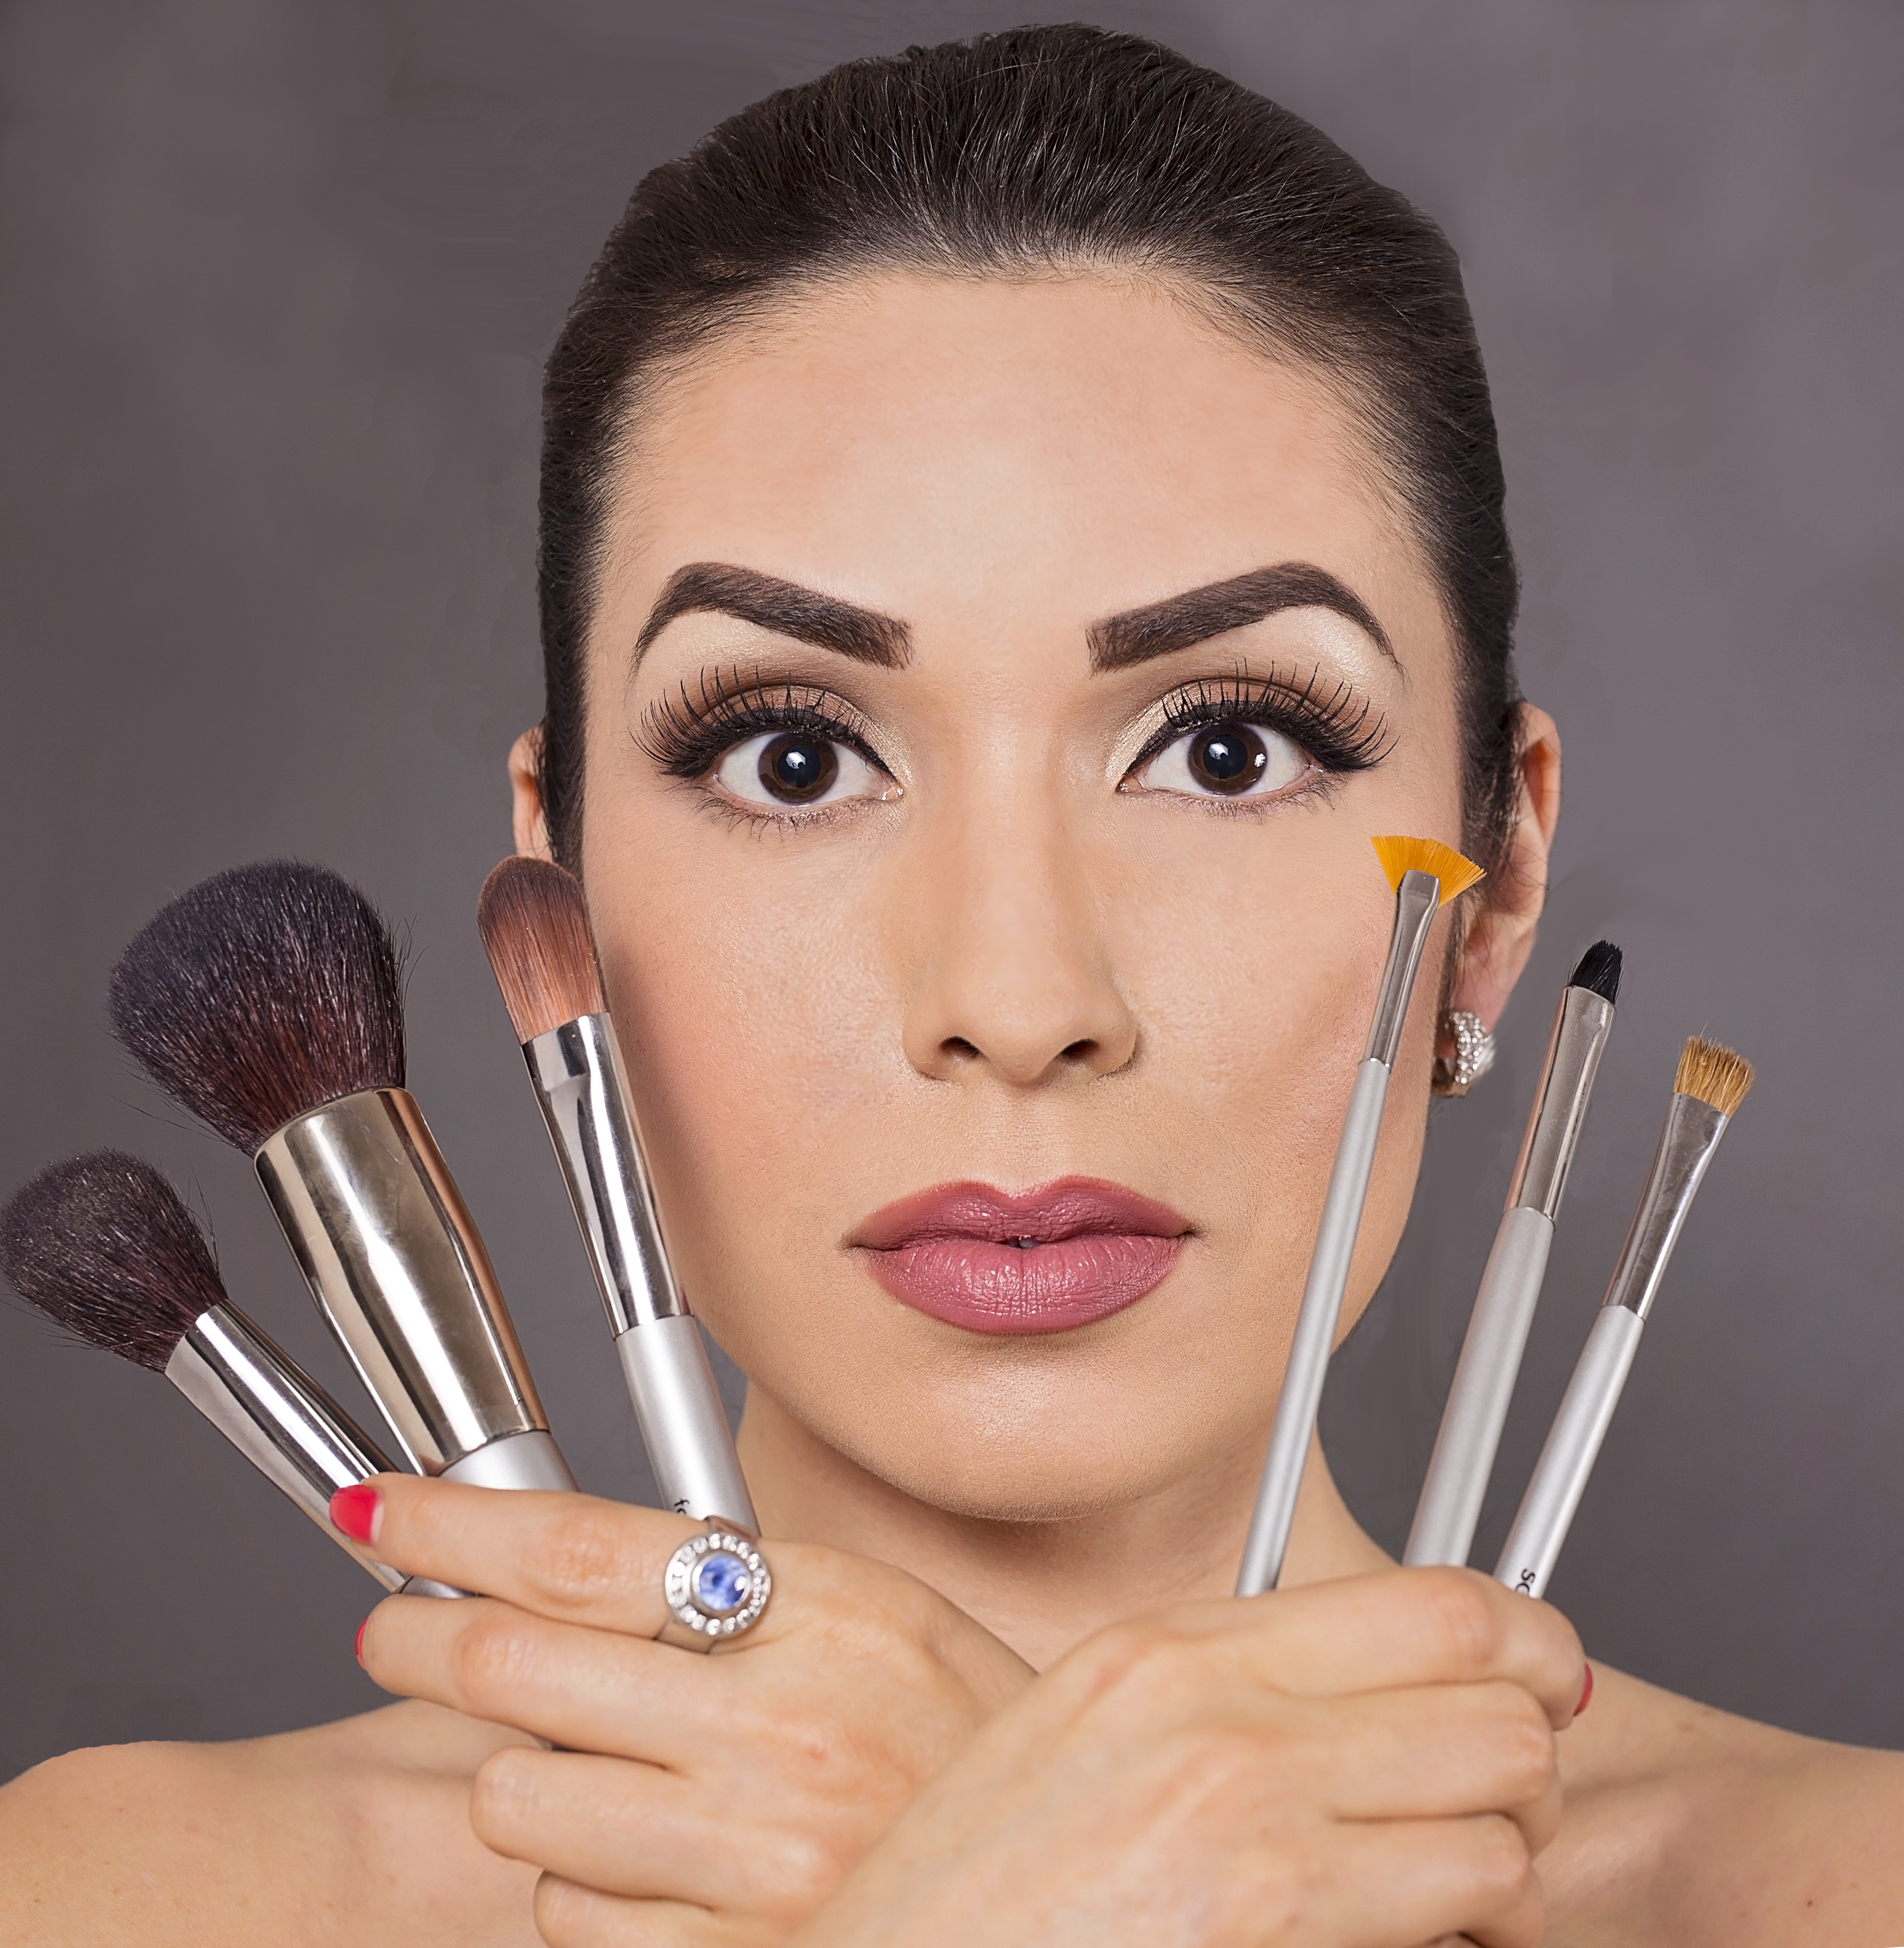 Shunay Mineral Cosmetics Santa Fe Skin Care